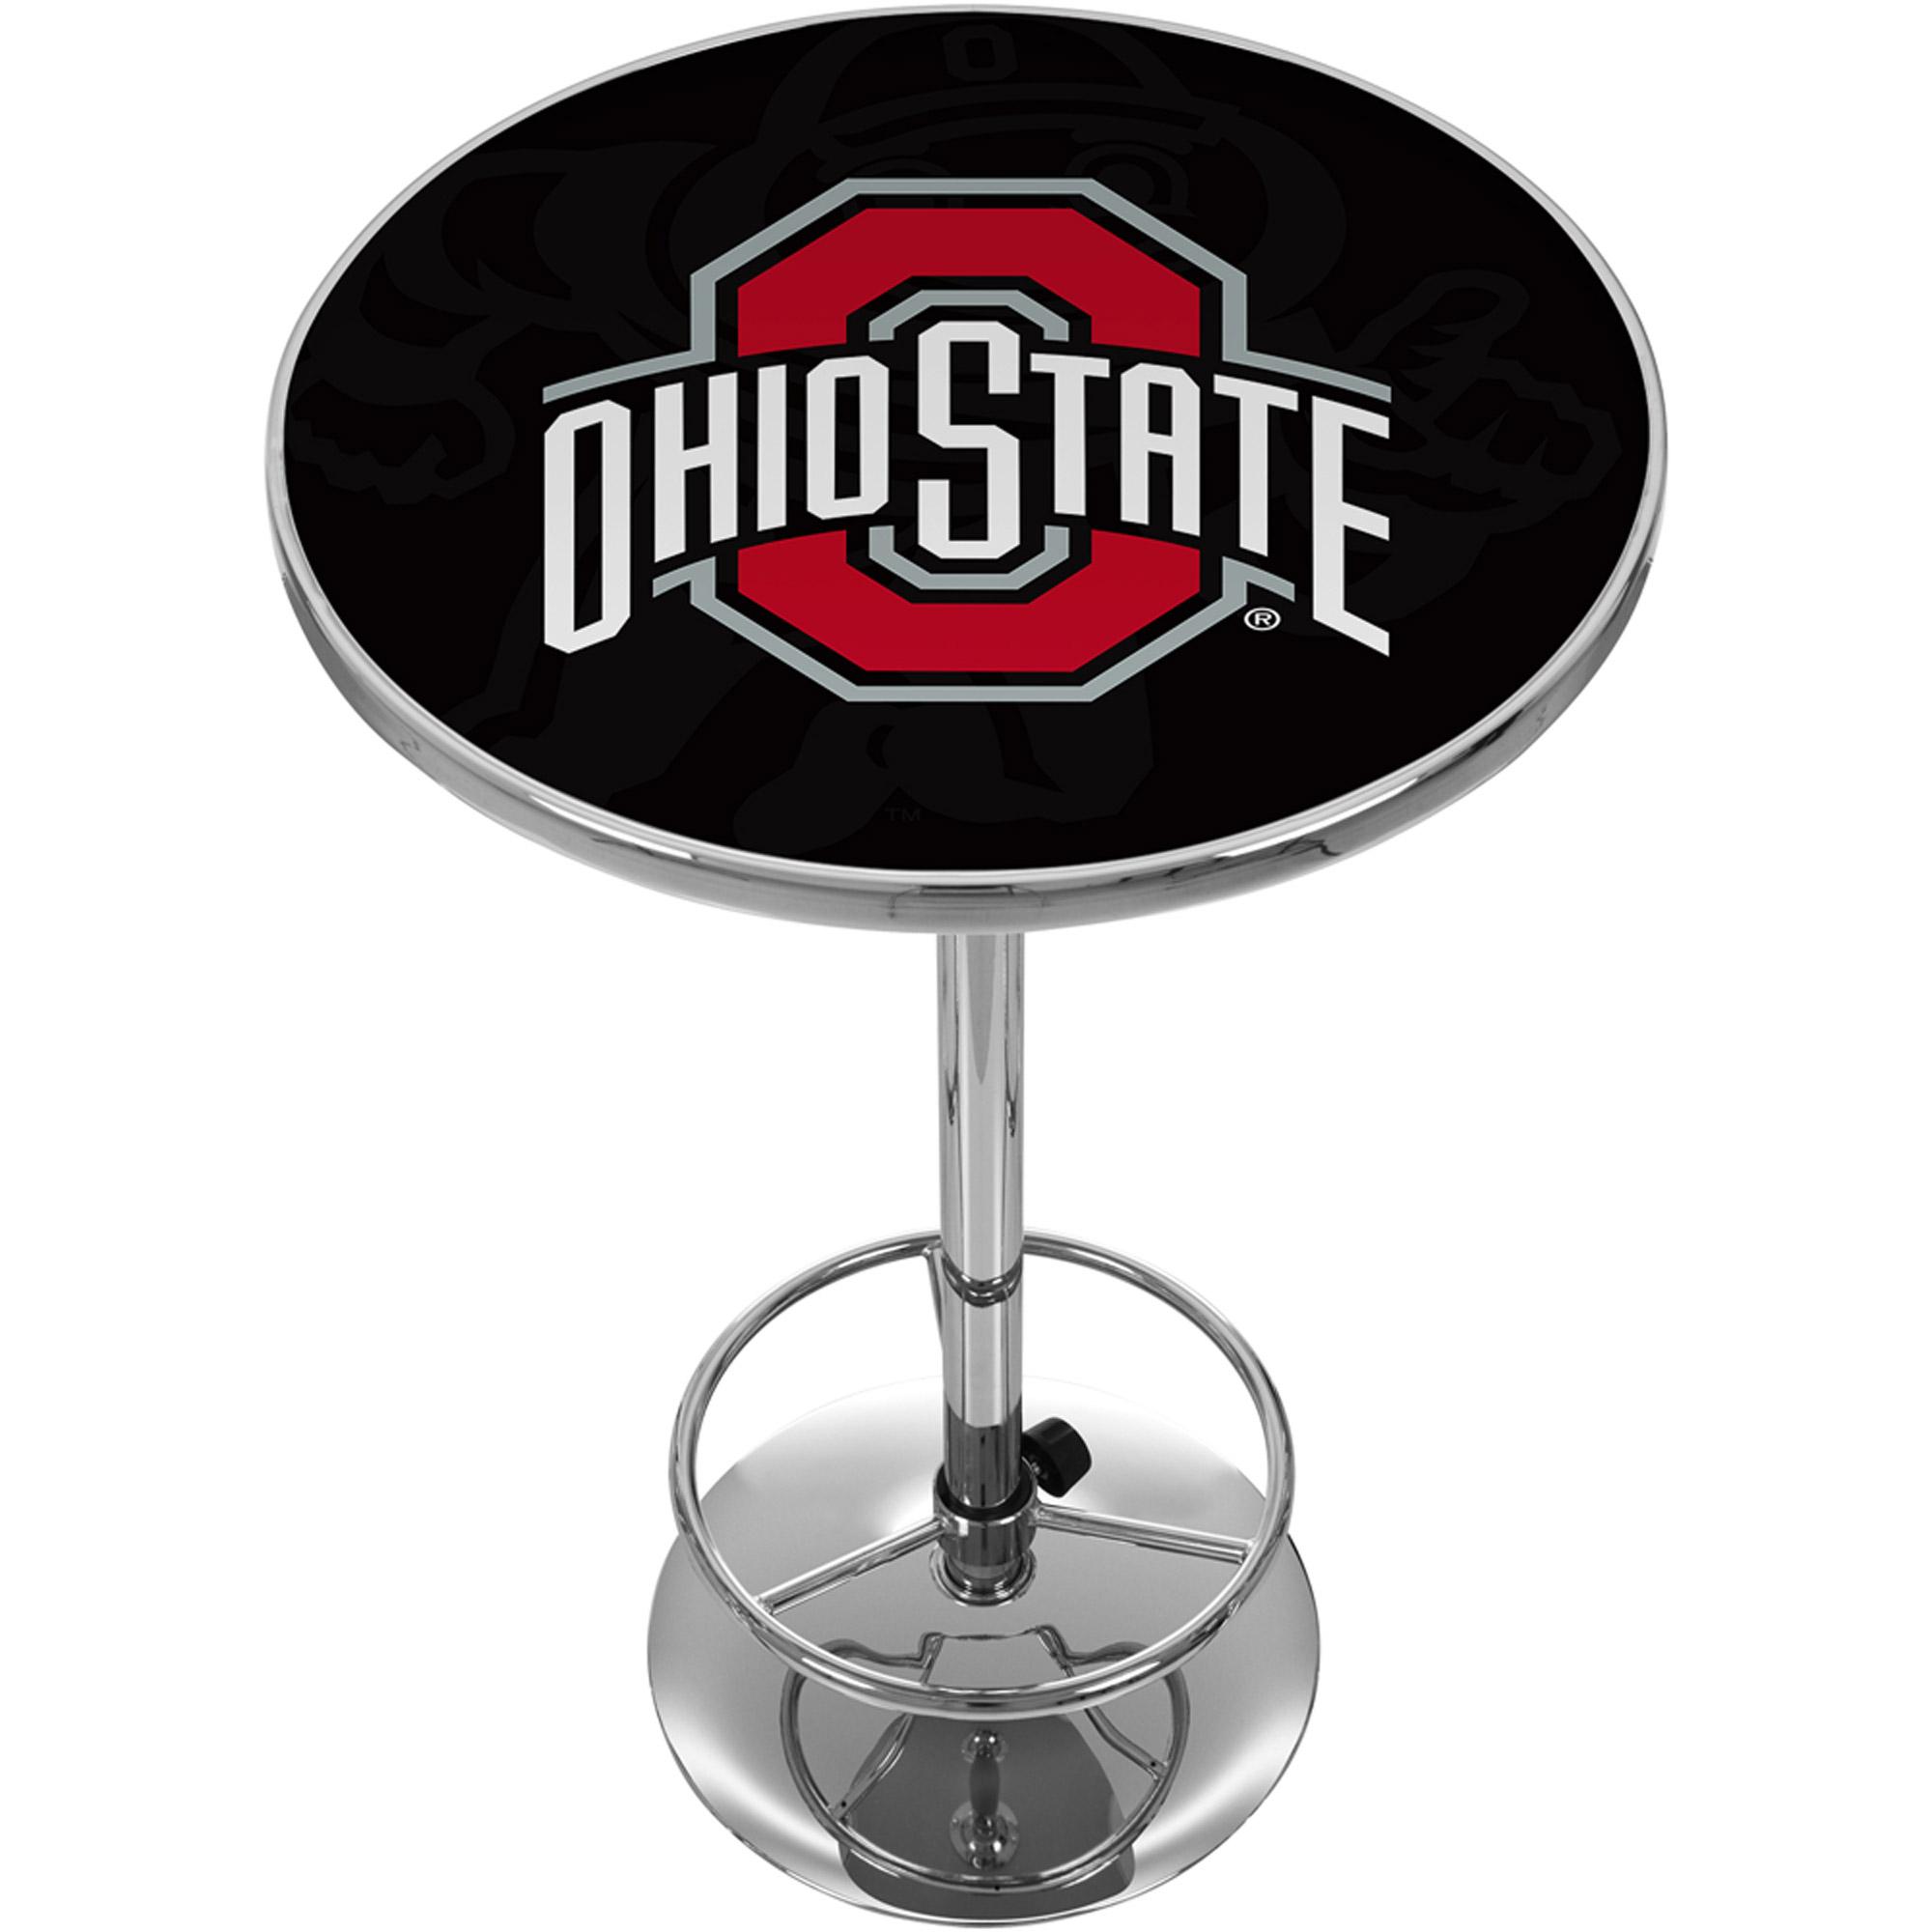 Ohio State Shadow Brutus Chrome Pub Table